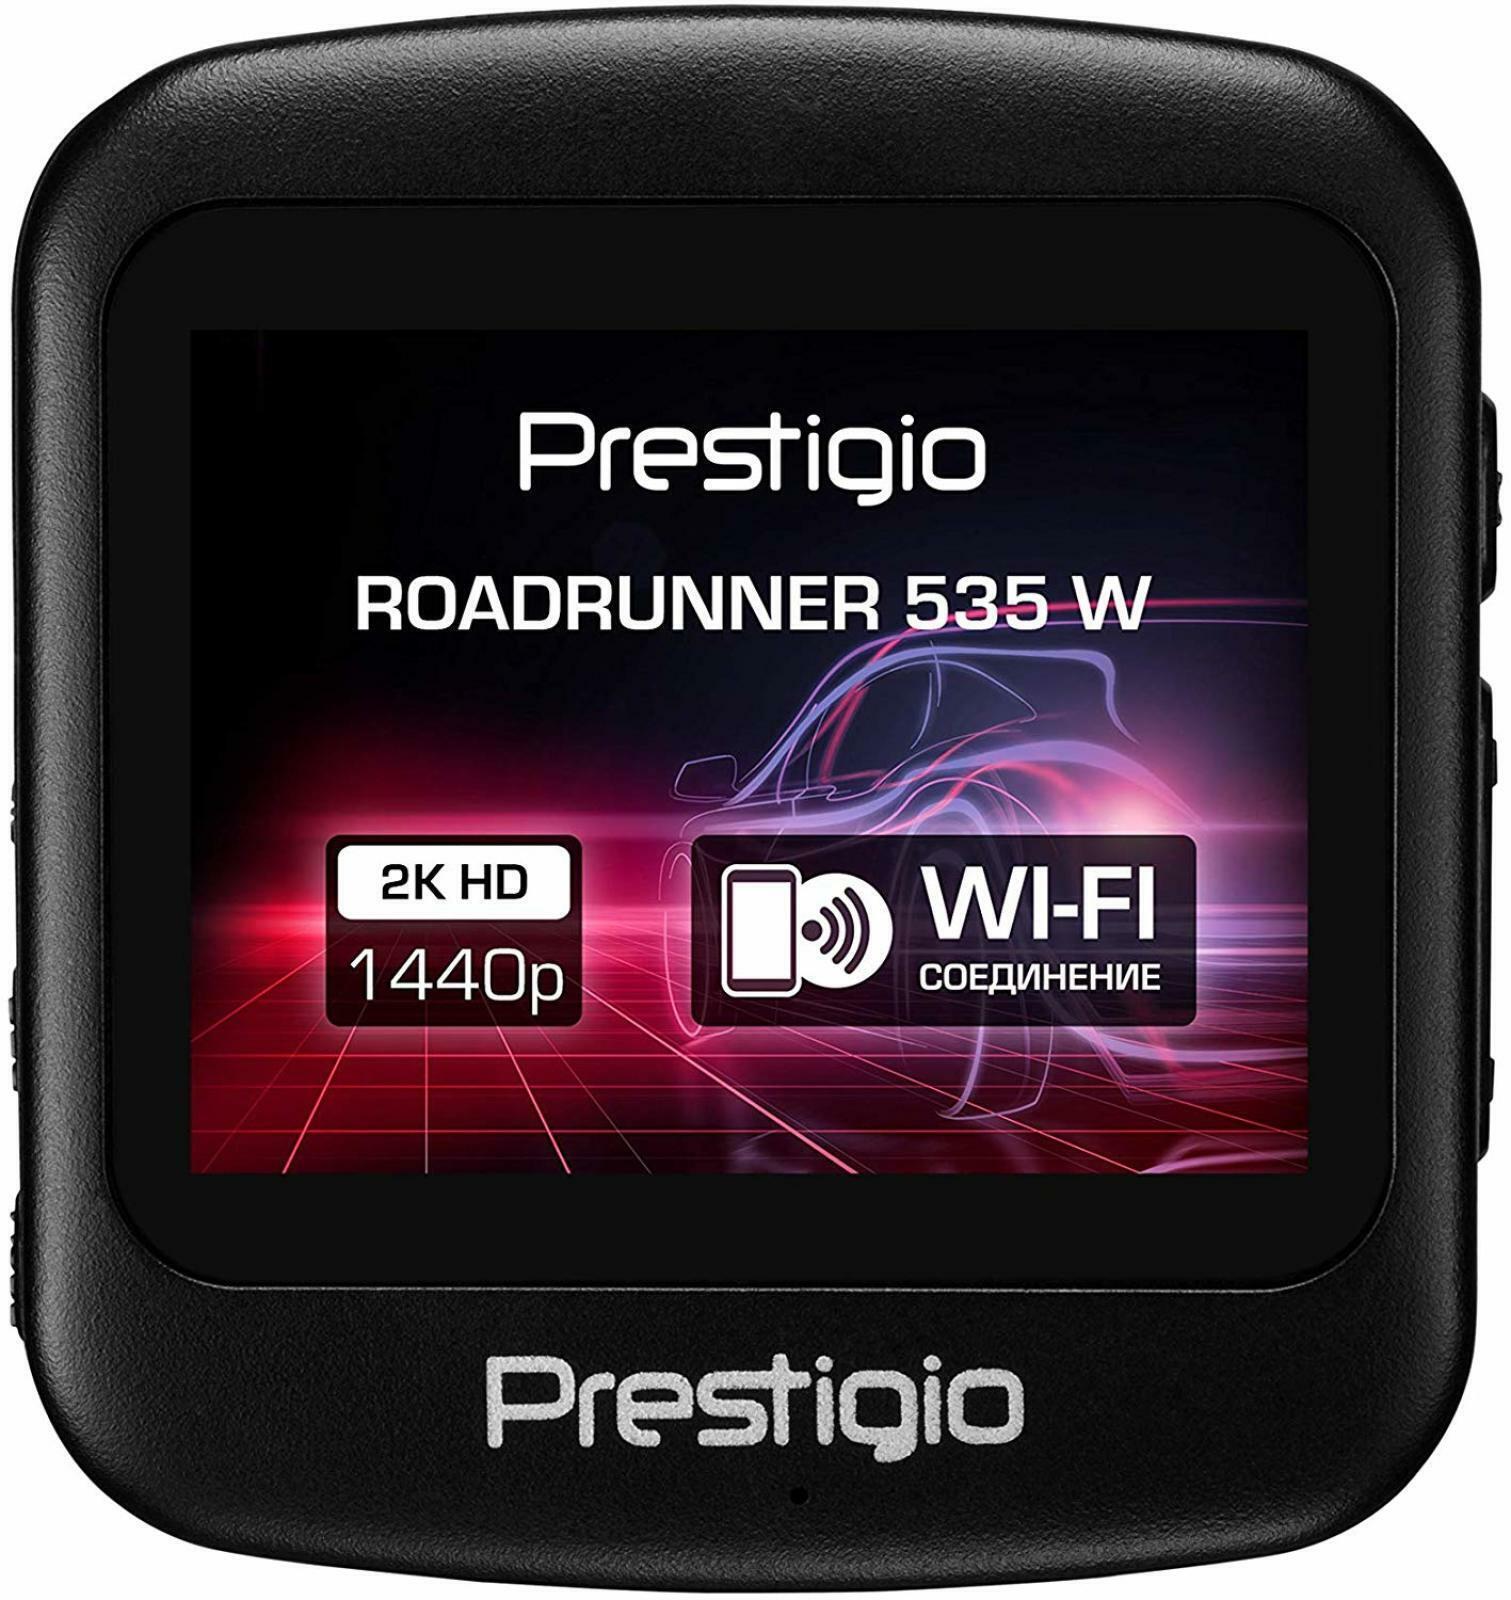 Details about Prestigio Car Dash Cam 2K 1440 P with BultIn Wifi Night  Vision 535W Black 2 Inch